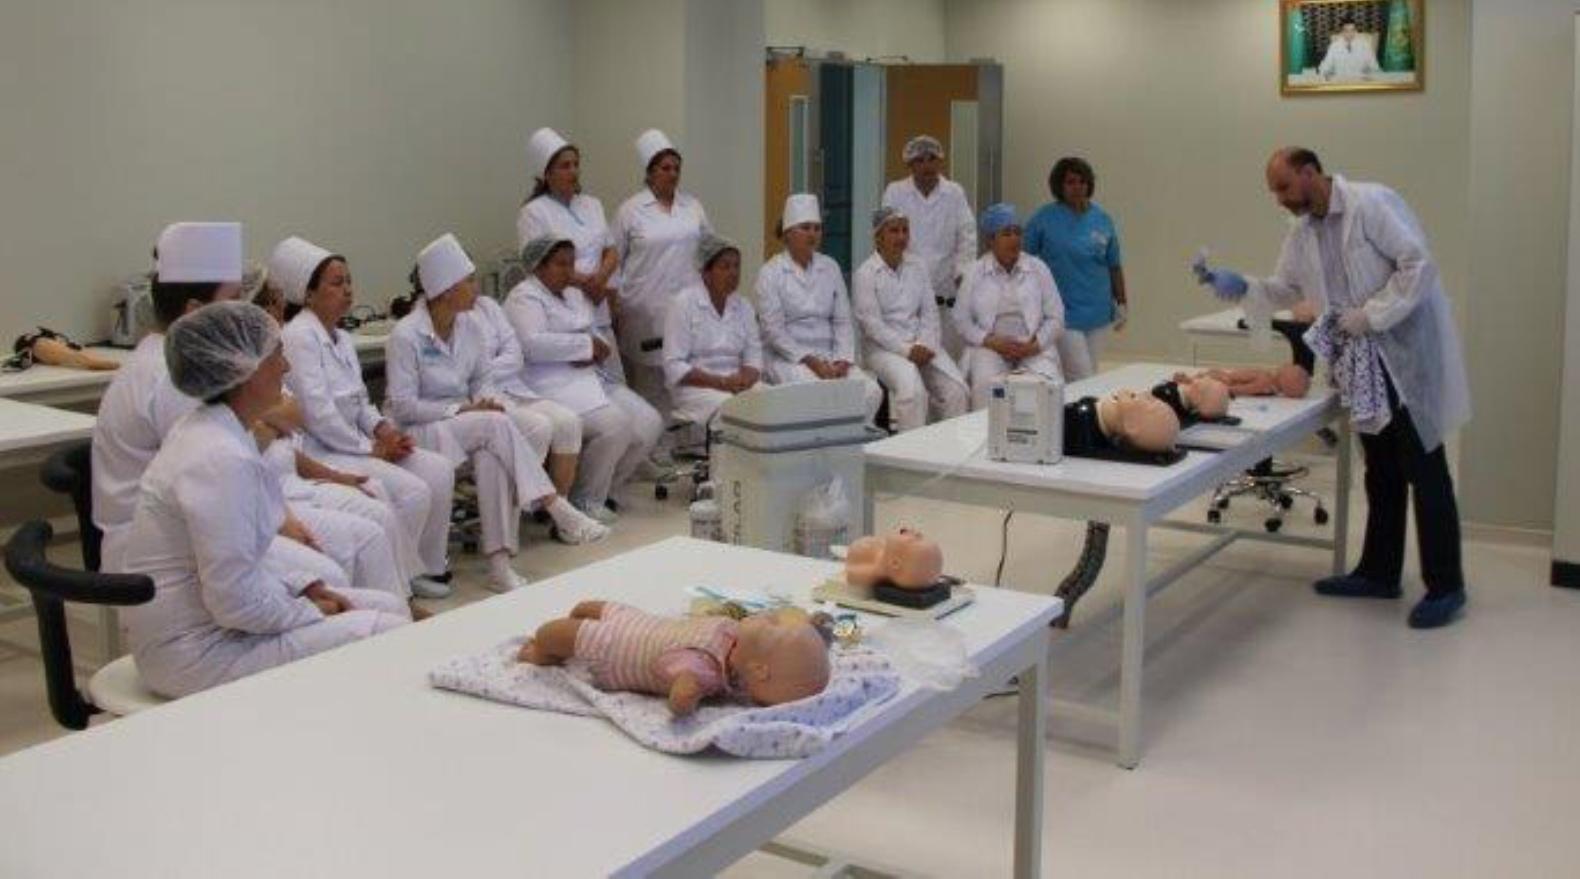 Israeli neonatal experts teaching skills to hospital staff in Turkmenistan. Photo courtesy of MASHAV